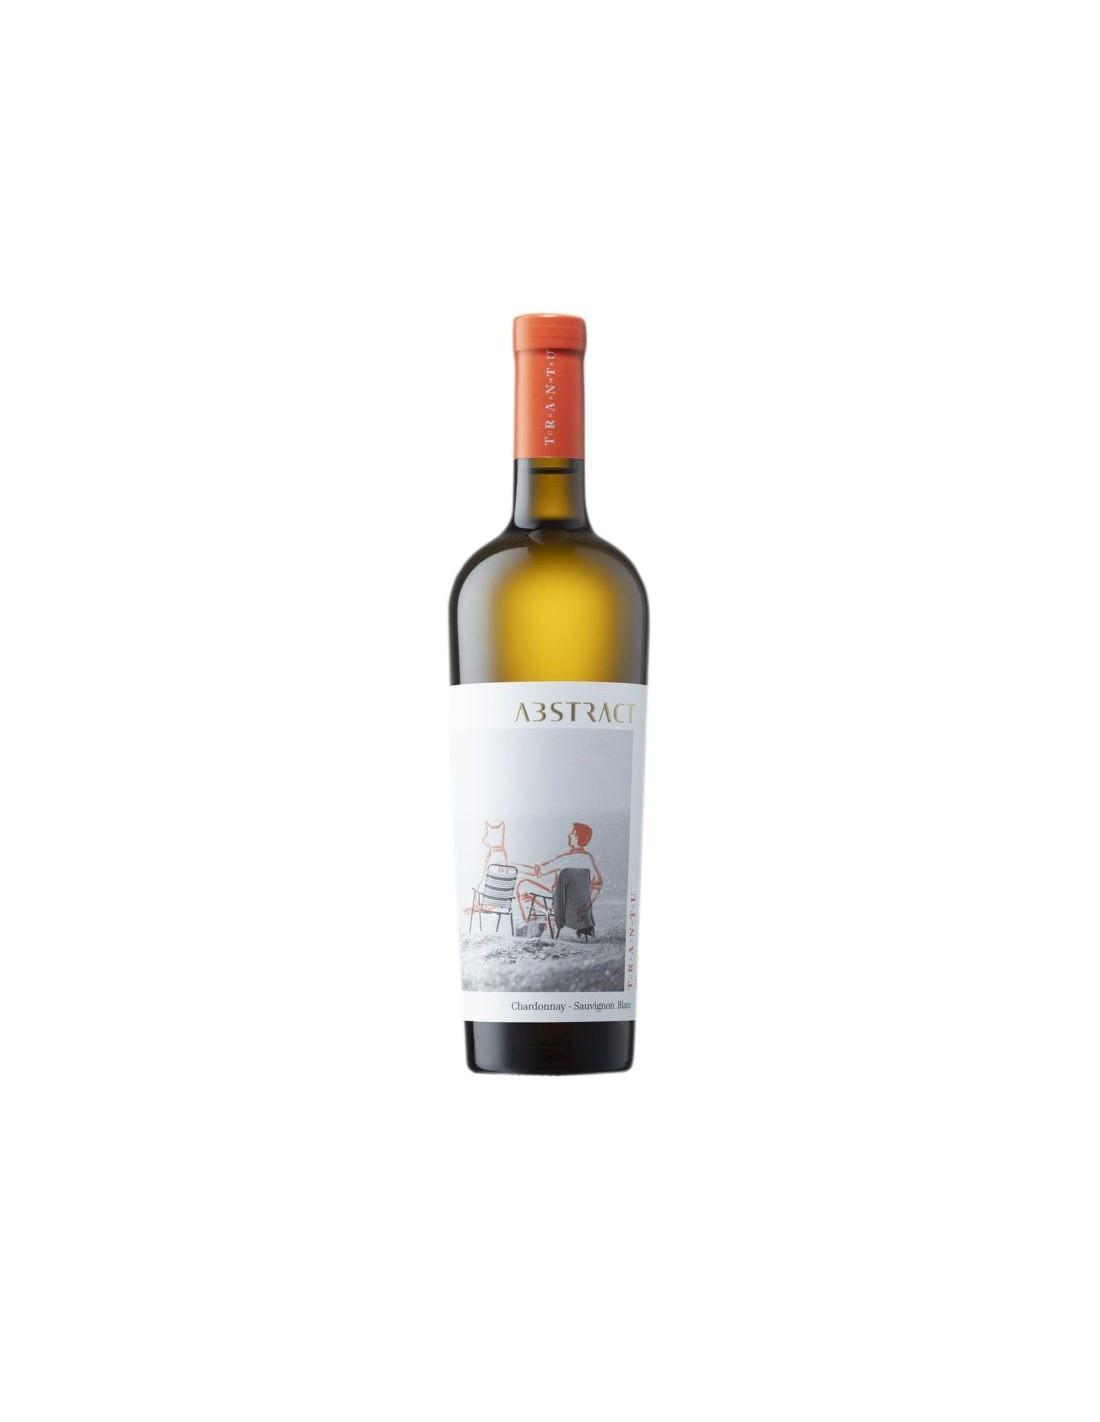 Vin alb sec, Chardonnay - Sauvignon Blanc, Abstract Murfatlar, 0.75L, 14.5% alc., Romania